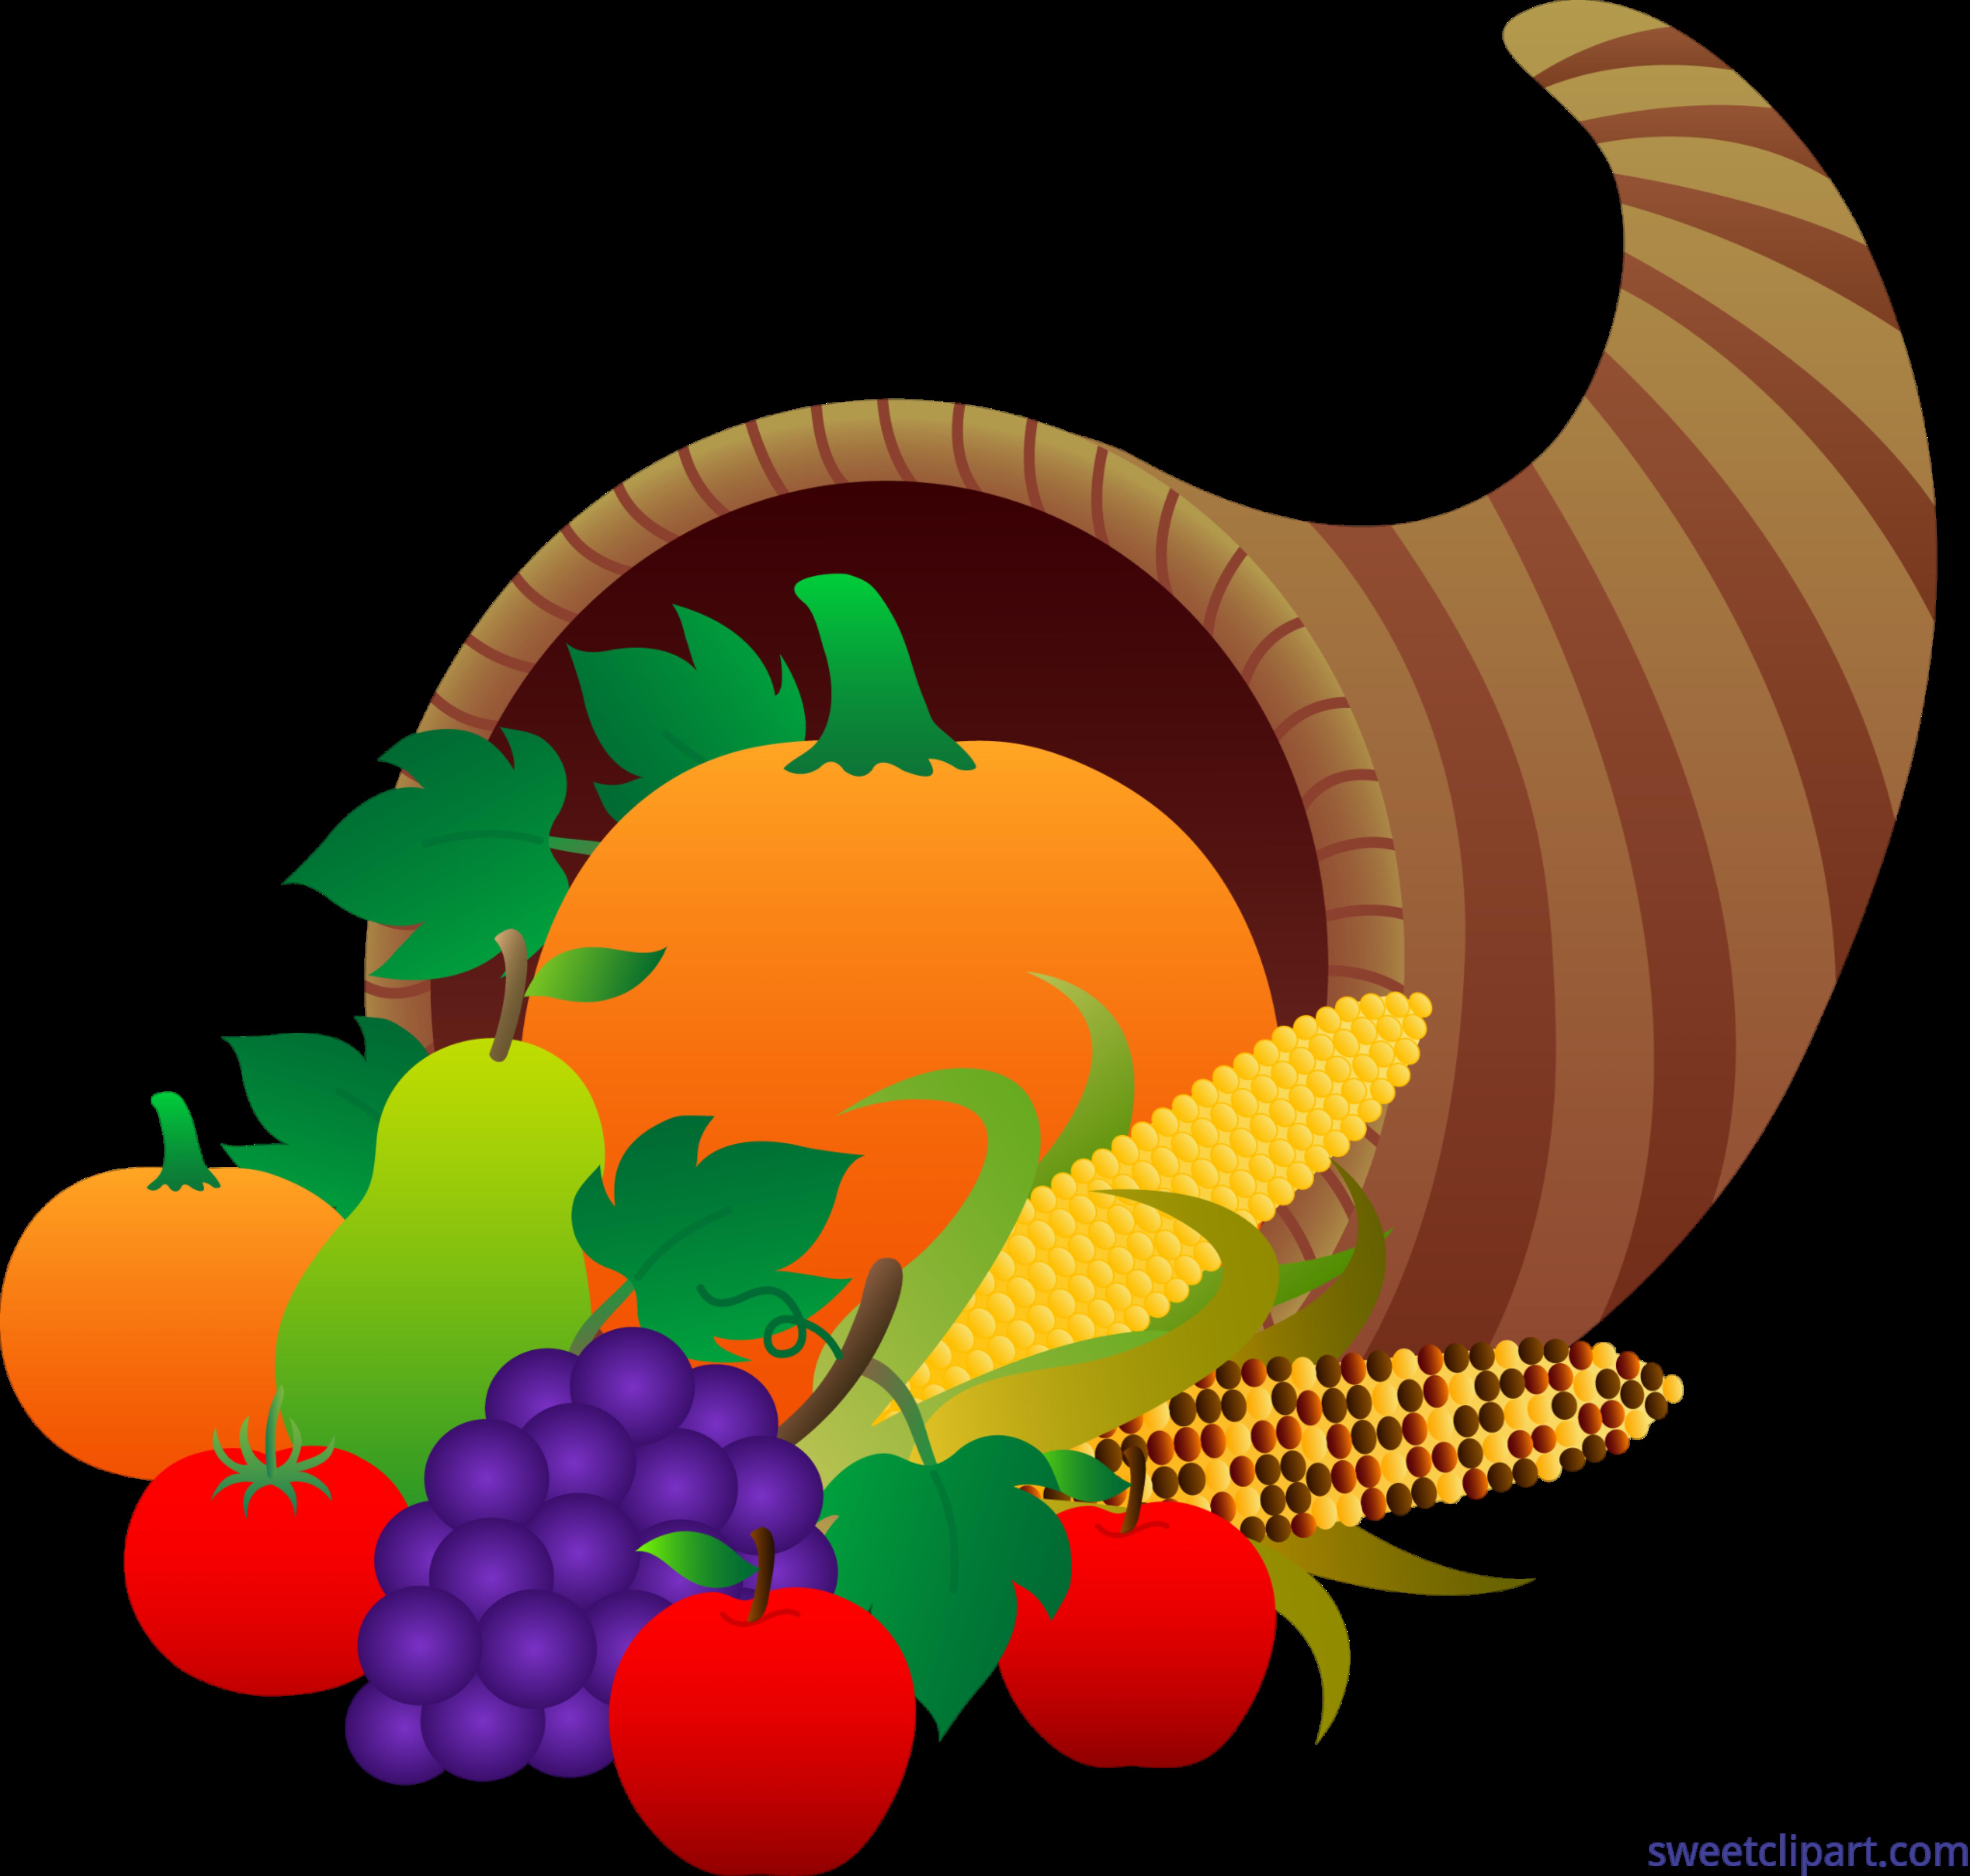 House clipart thanksgiving. Cornucopia clip art sweet